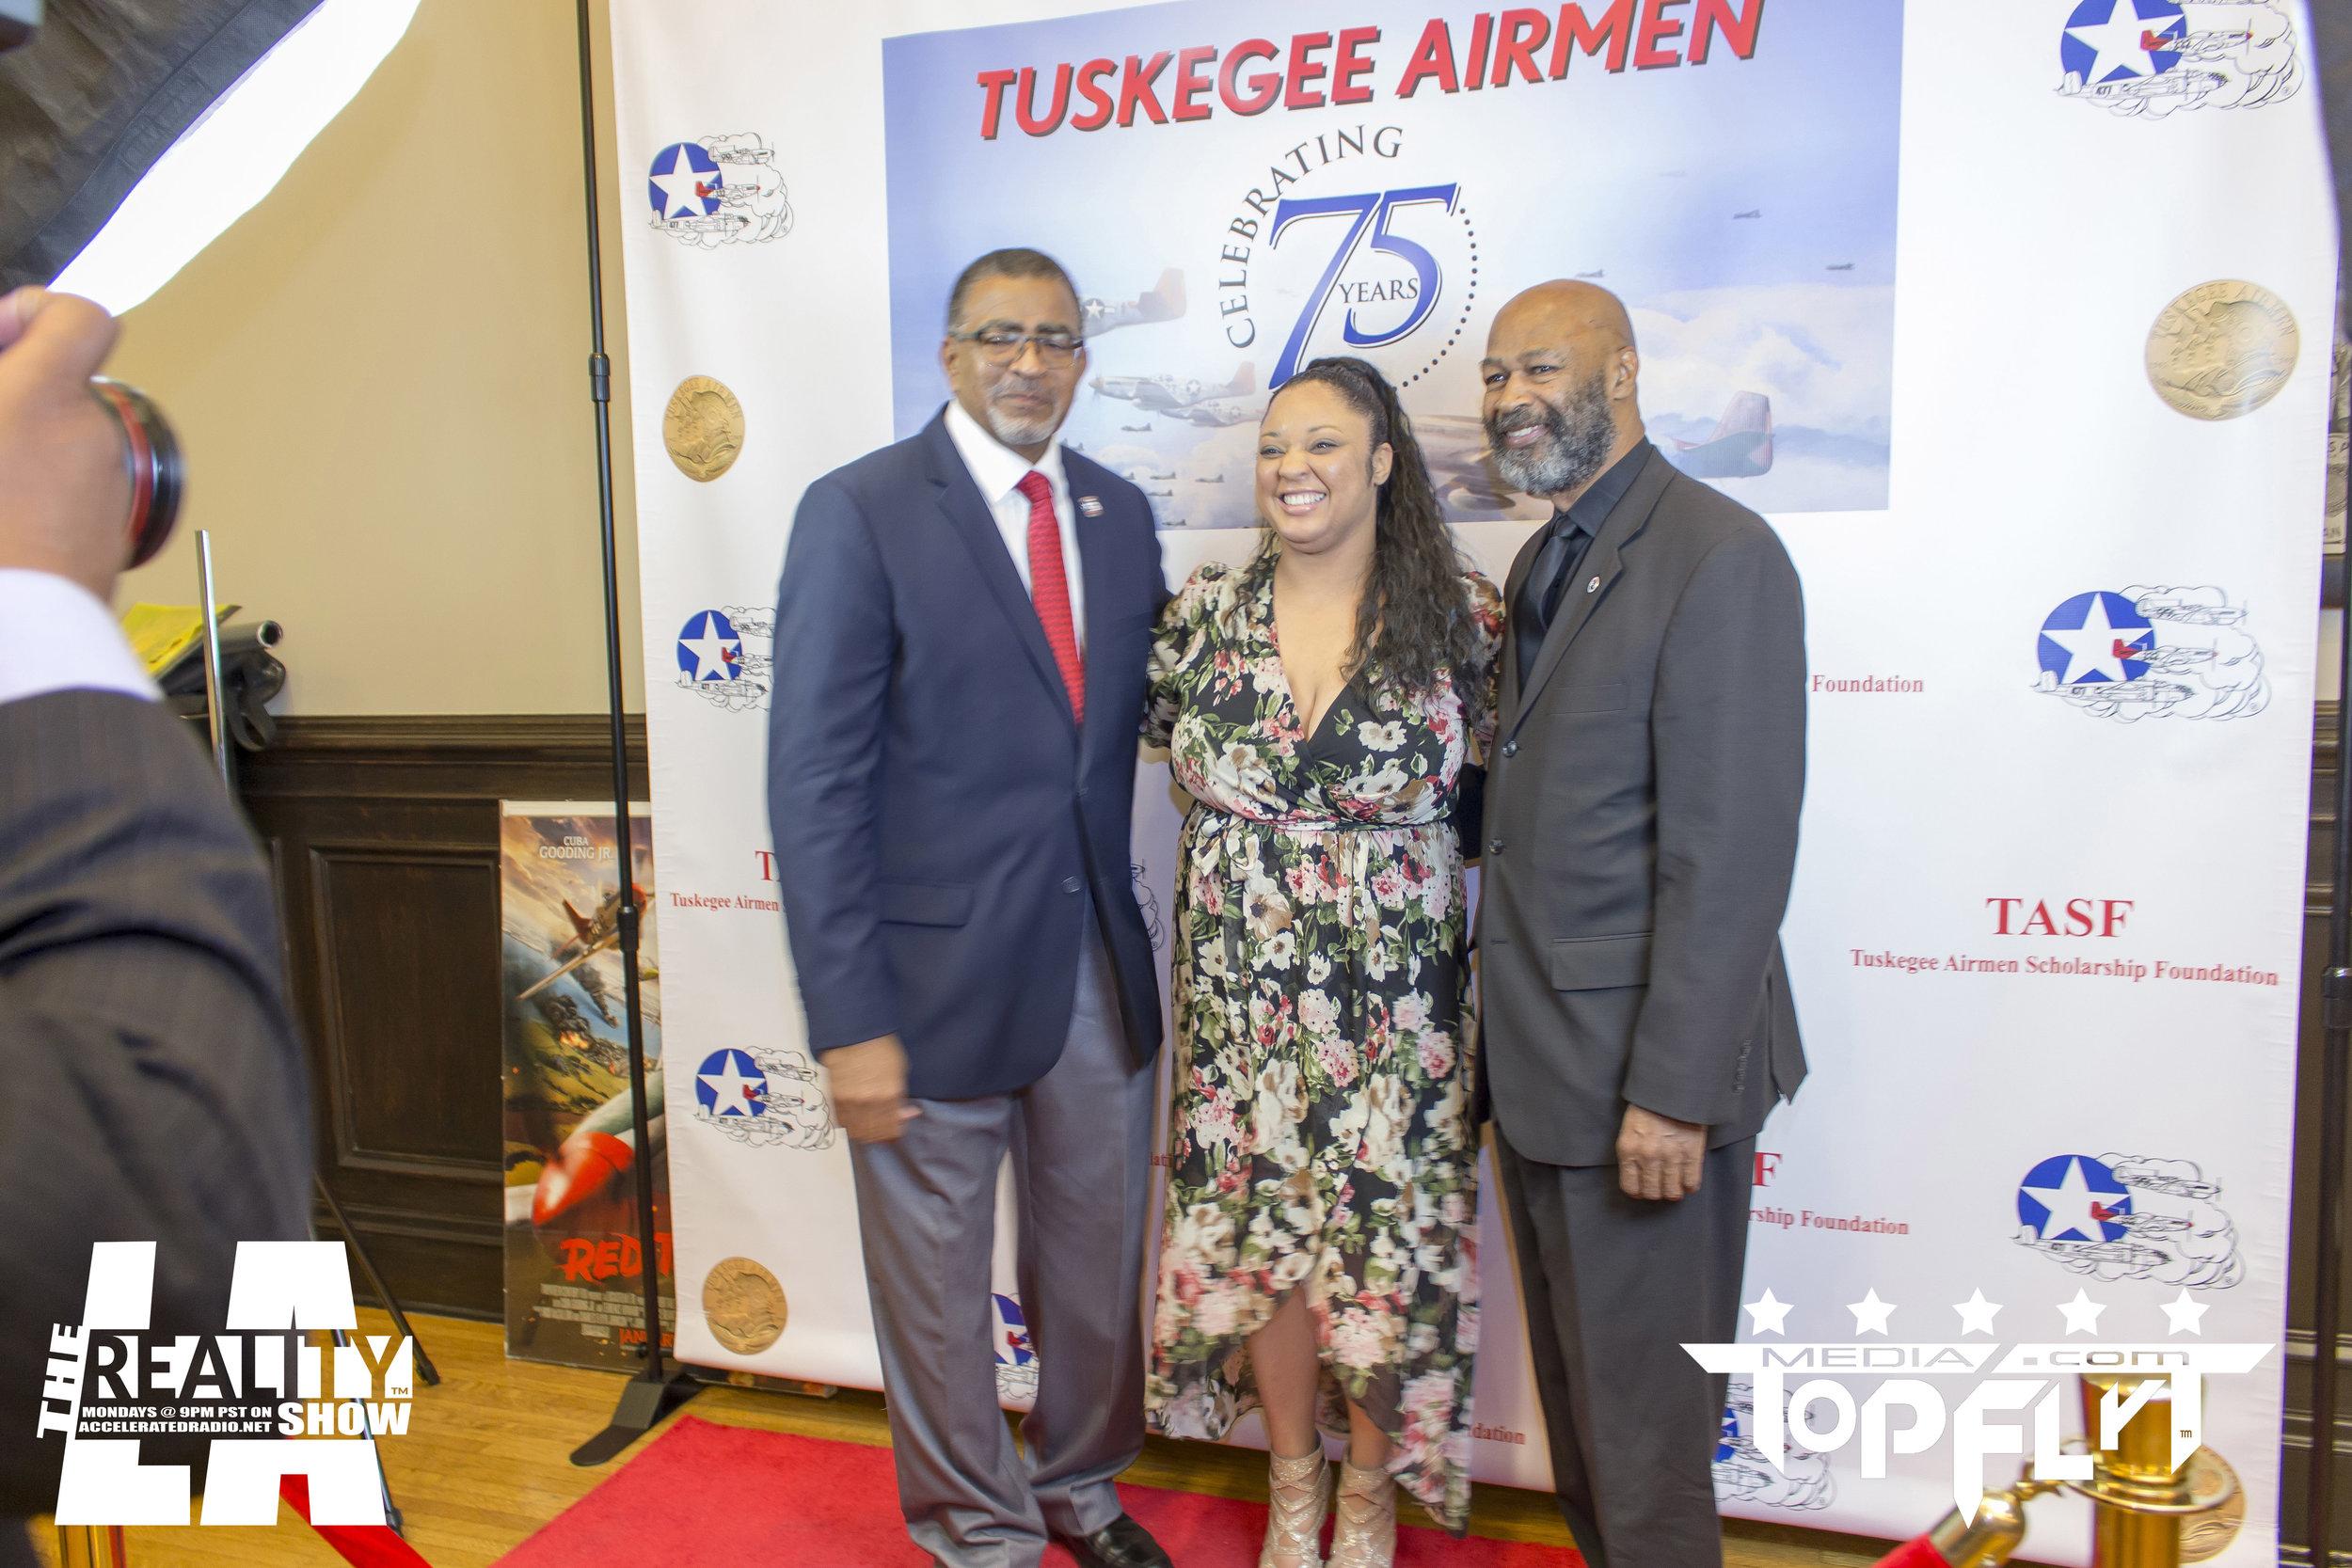 The Reality Show LA - Tuskegee Airmen 75th Anniversary VIP Reception_117.jpg